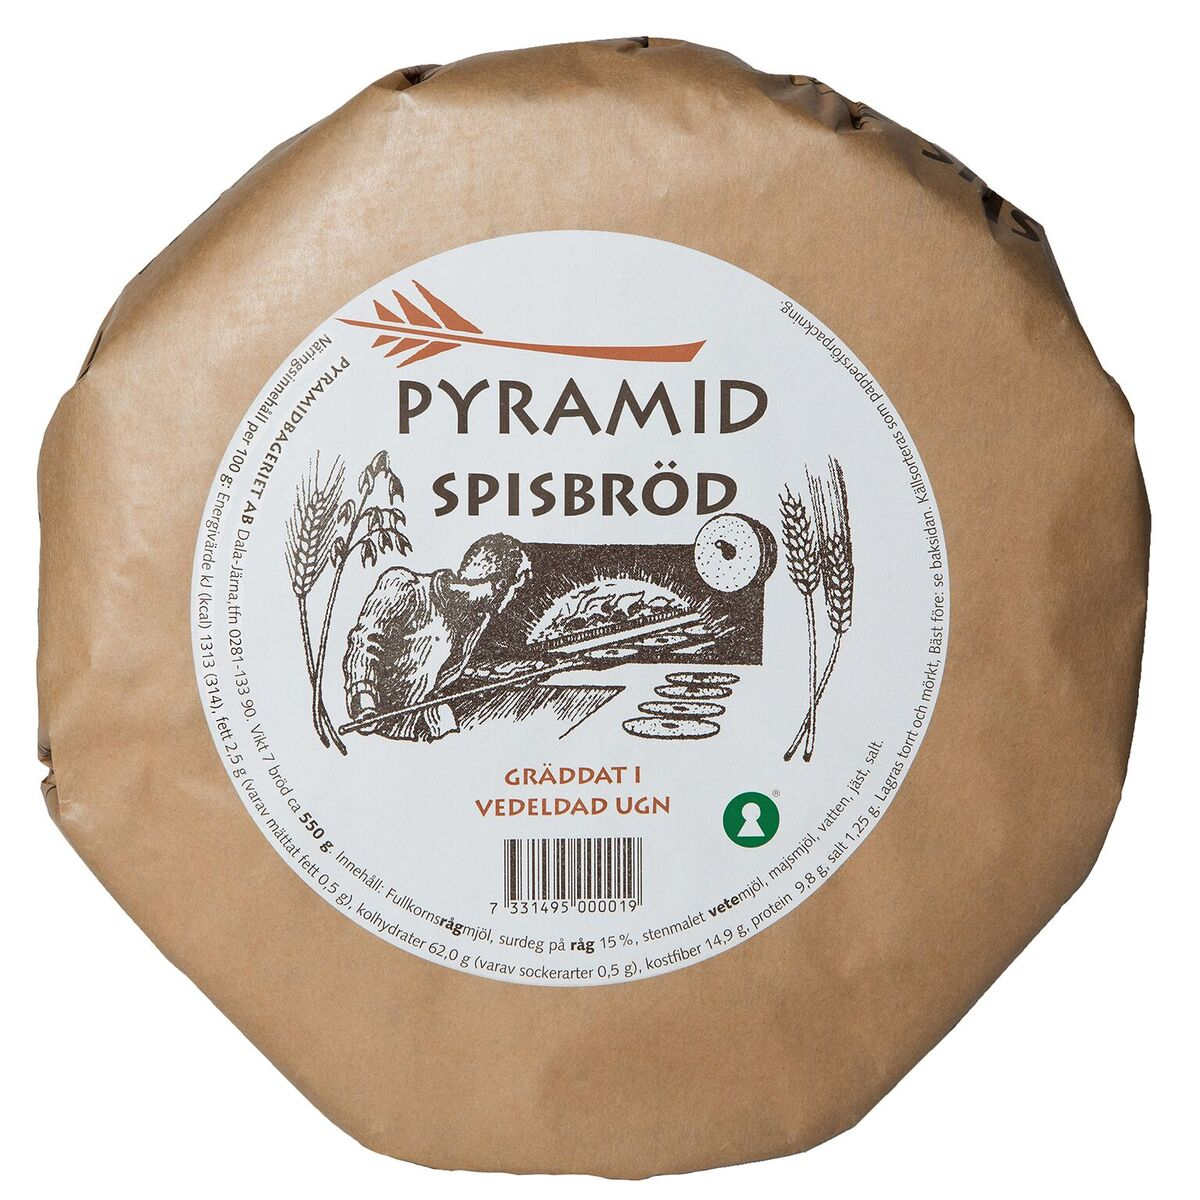 New Nordic_SE_Pyramidbröd_ Spisbröd ® Pyramidbröd